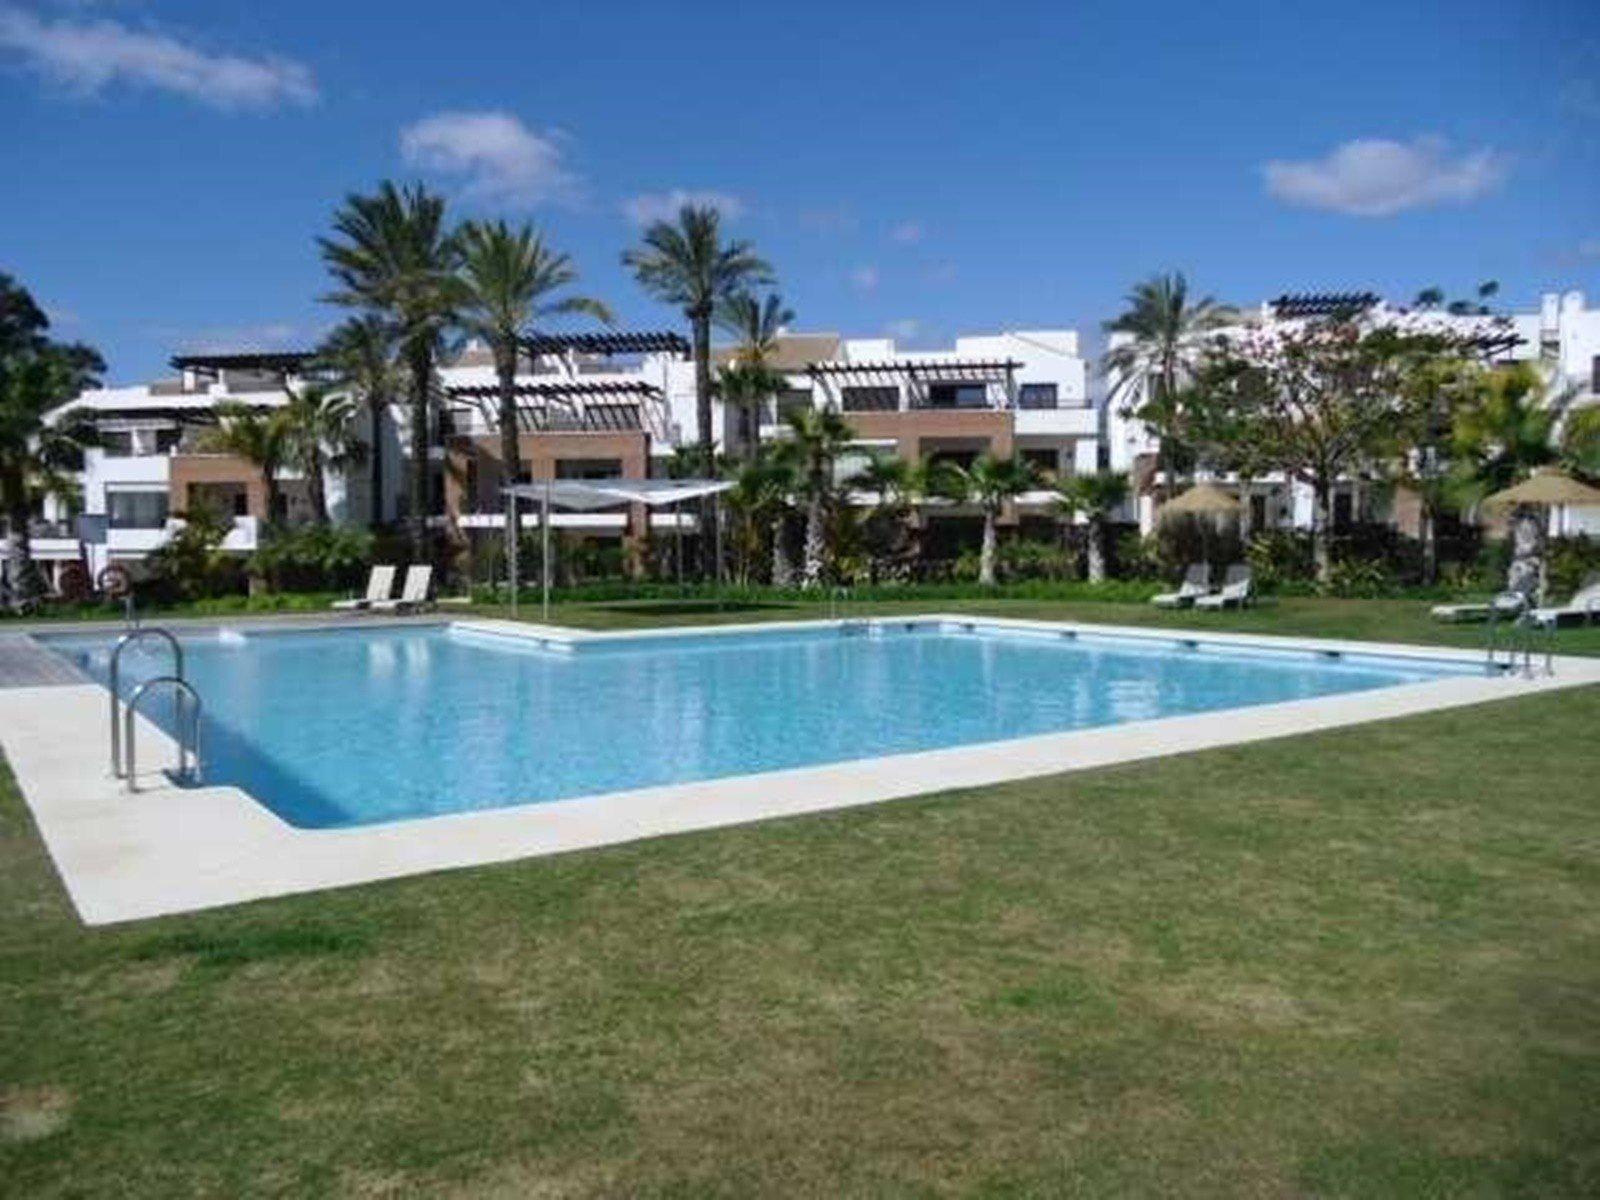 Apartment for sale in Estepona, Palm Gardens